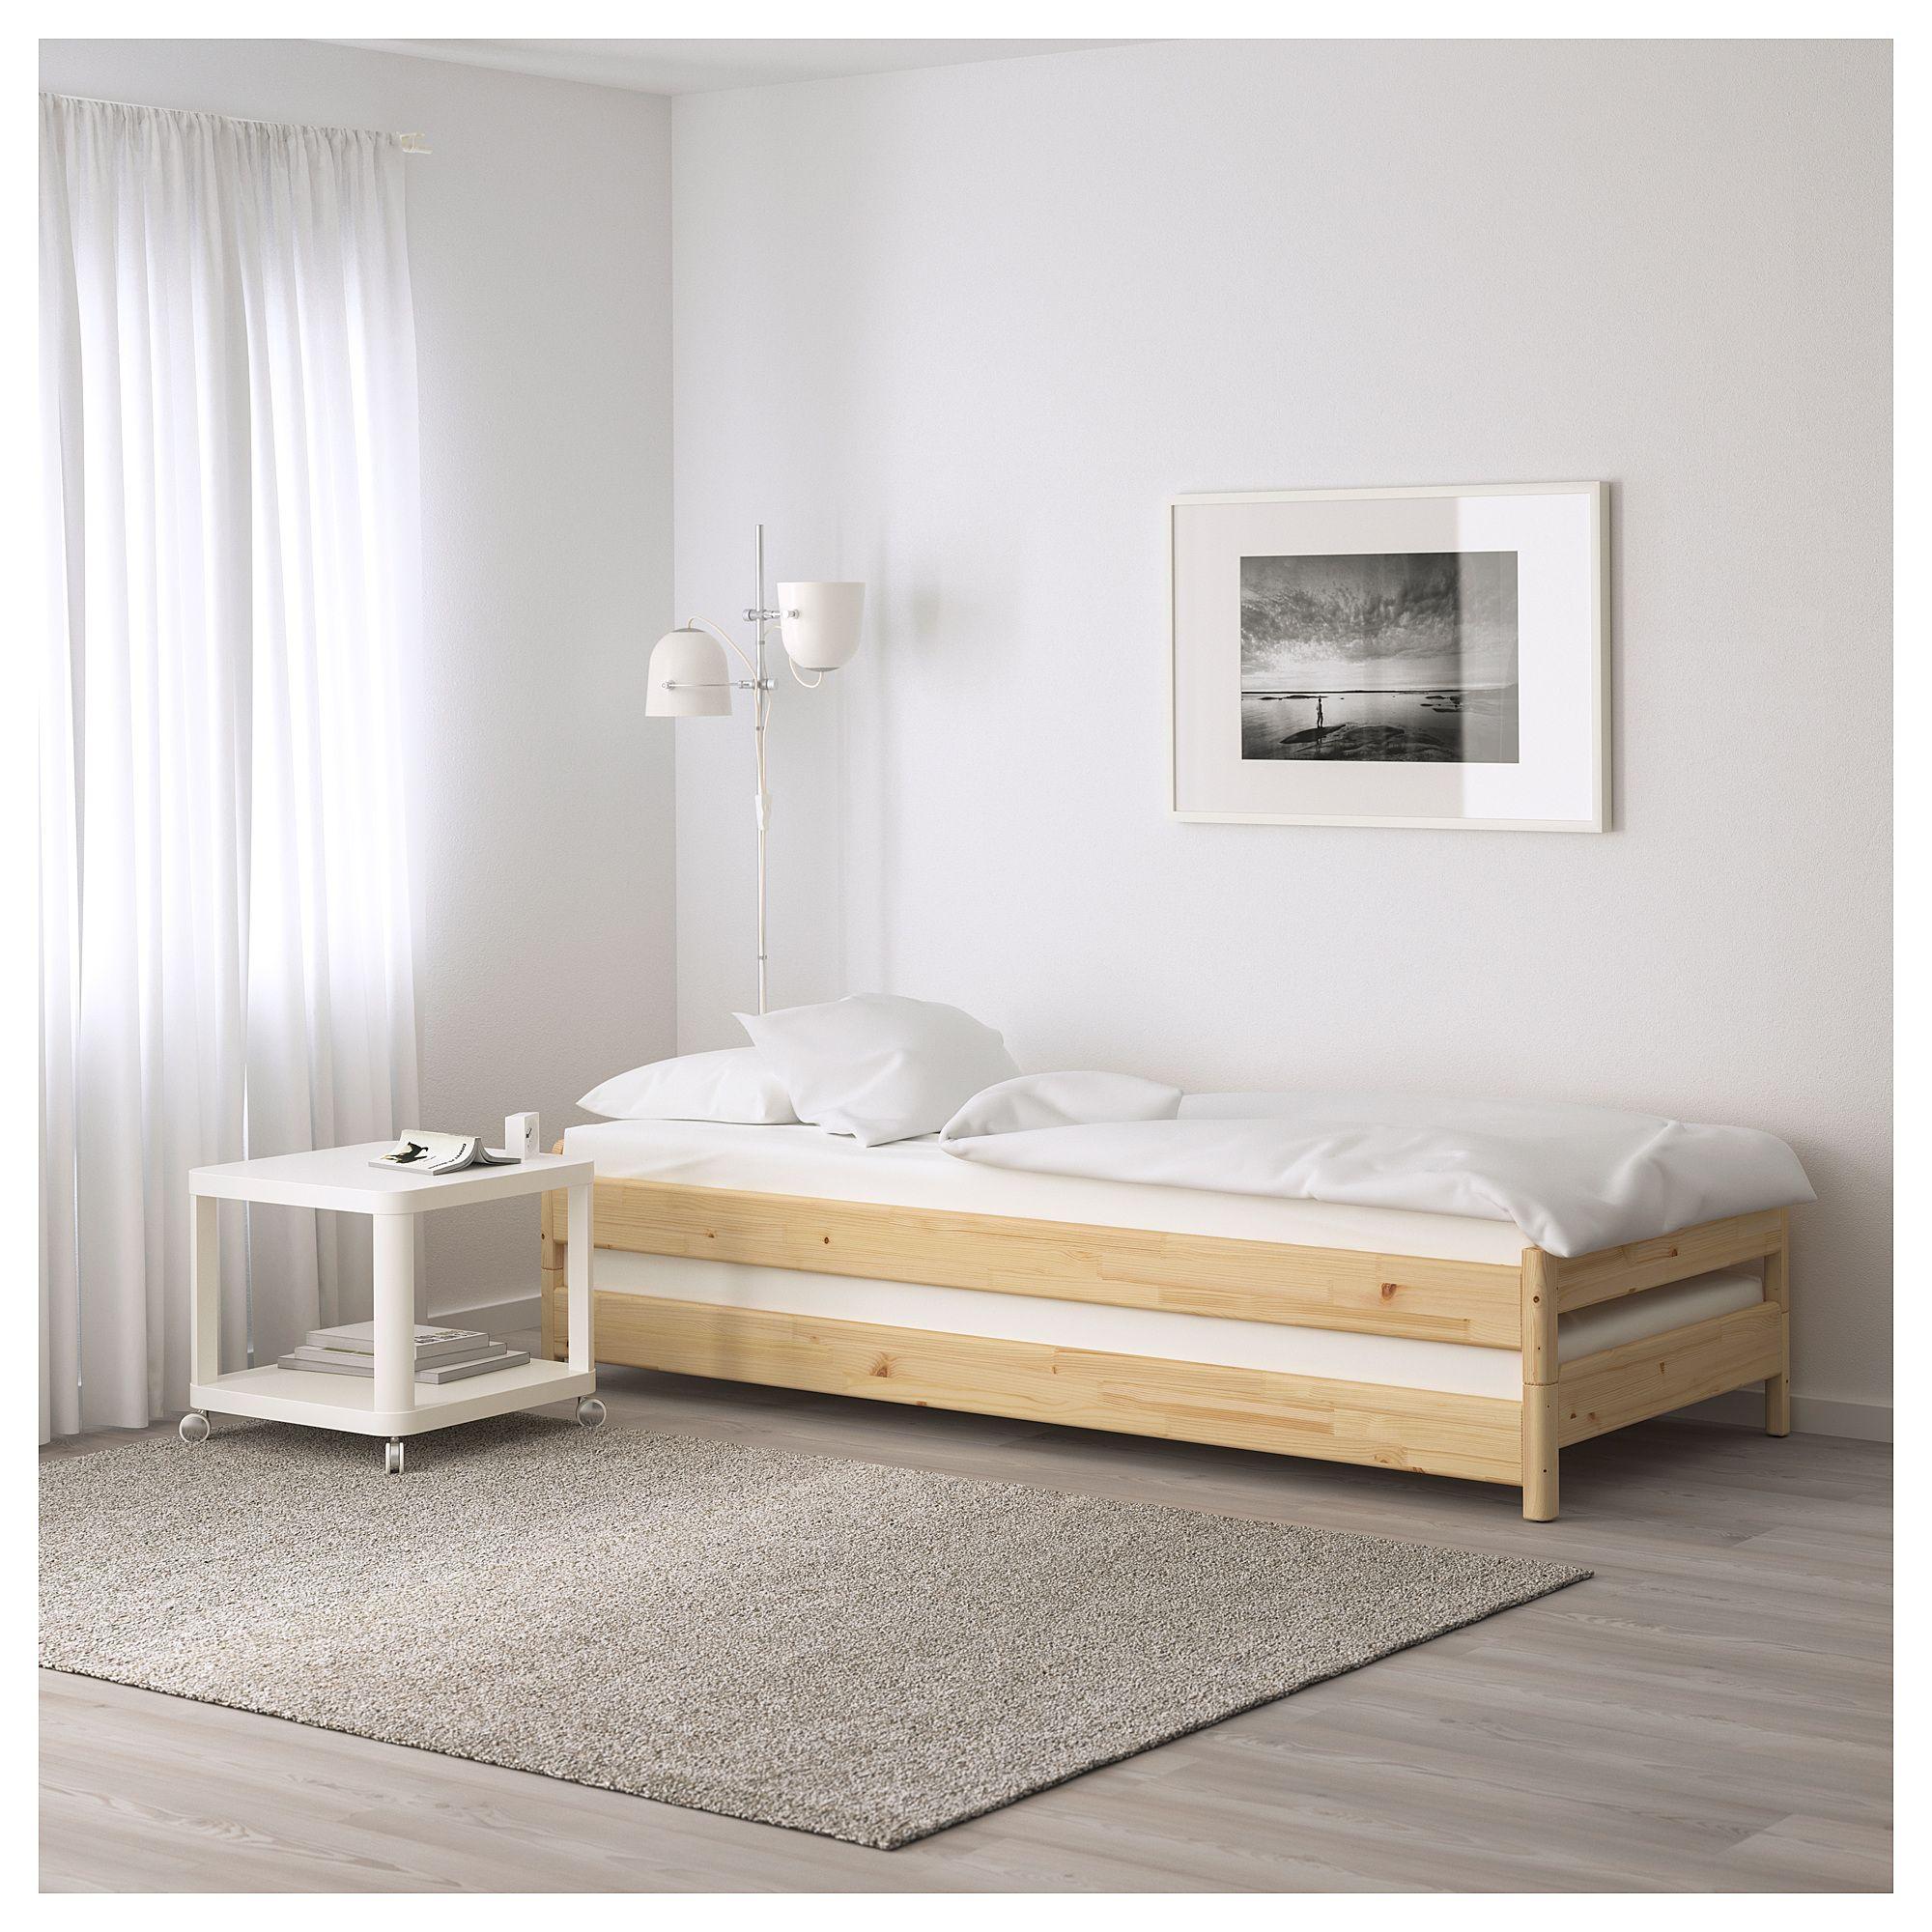 UTÅKER Stackable bed with 2 mattresses pine, Meistervik